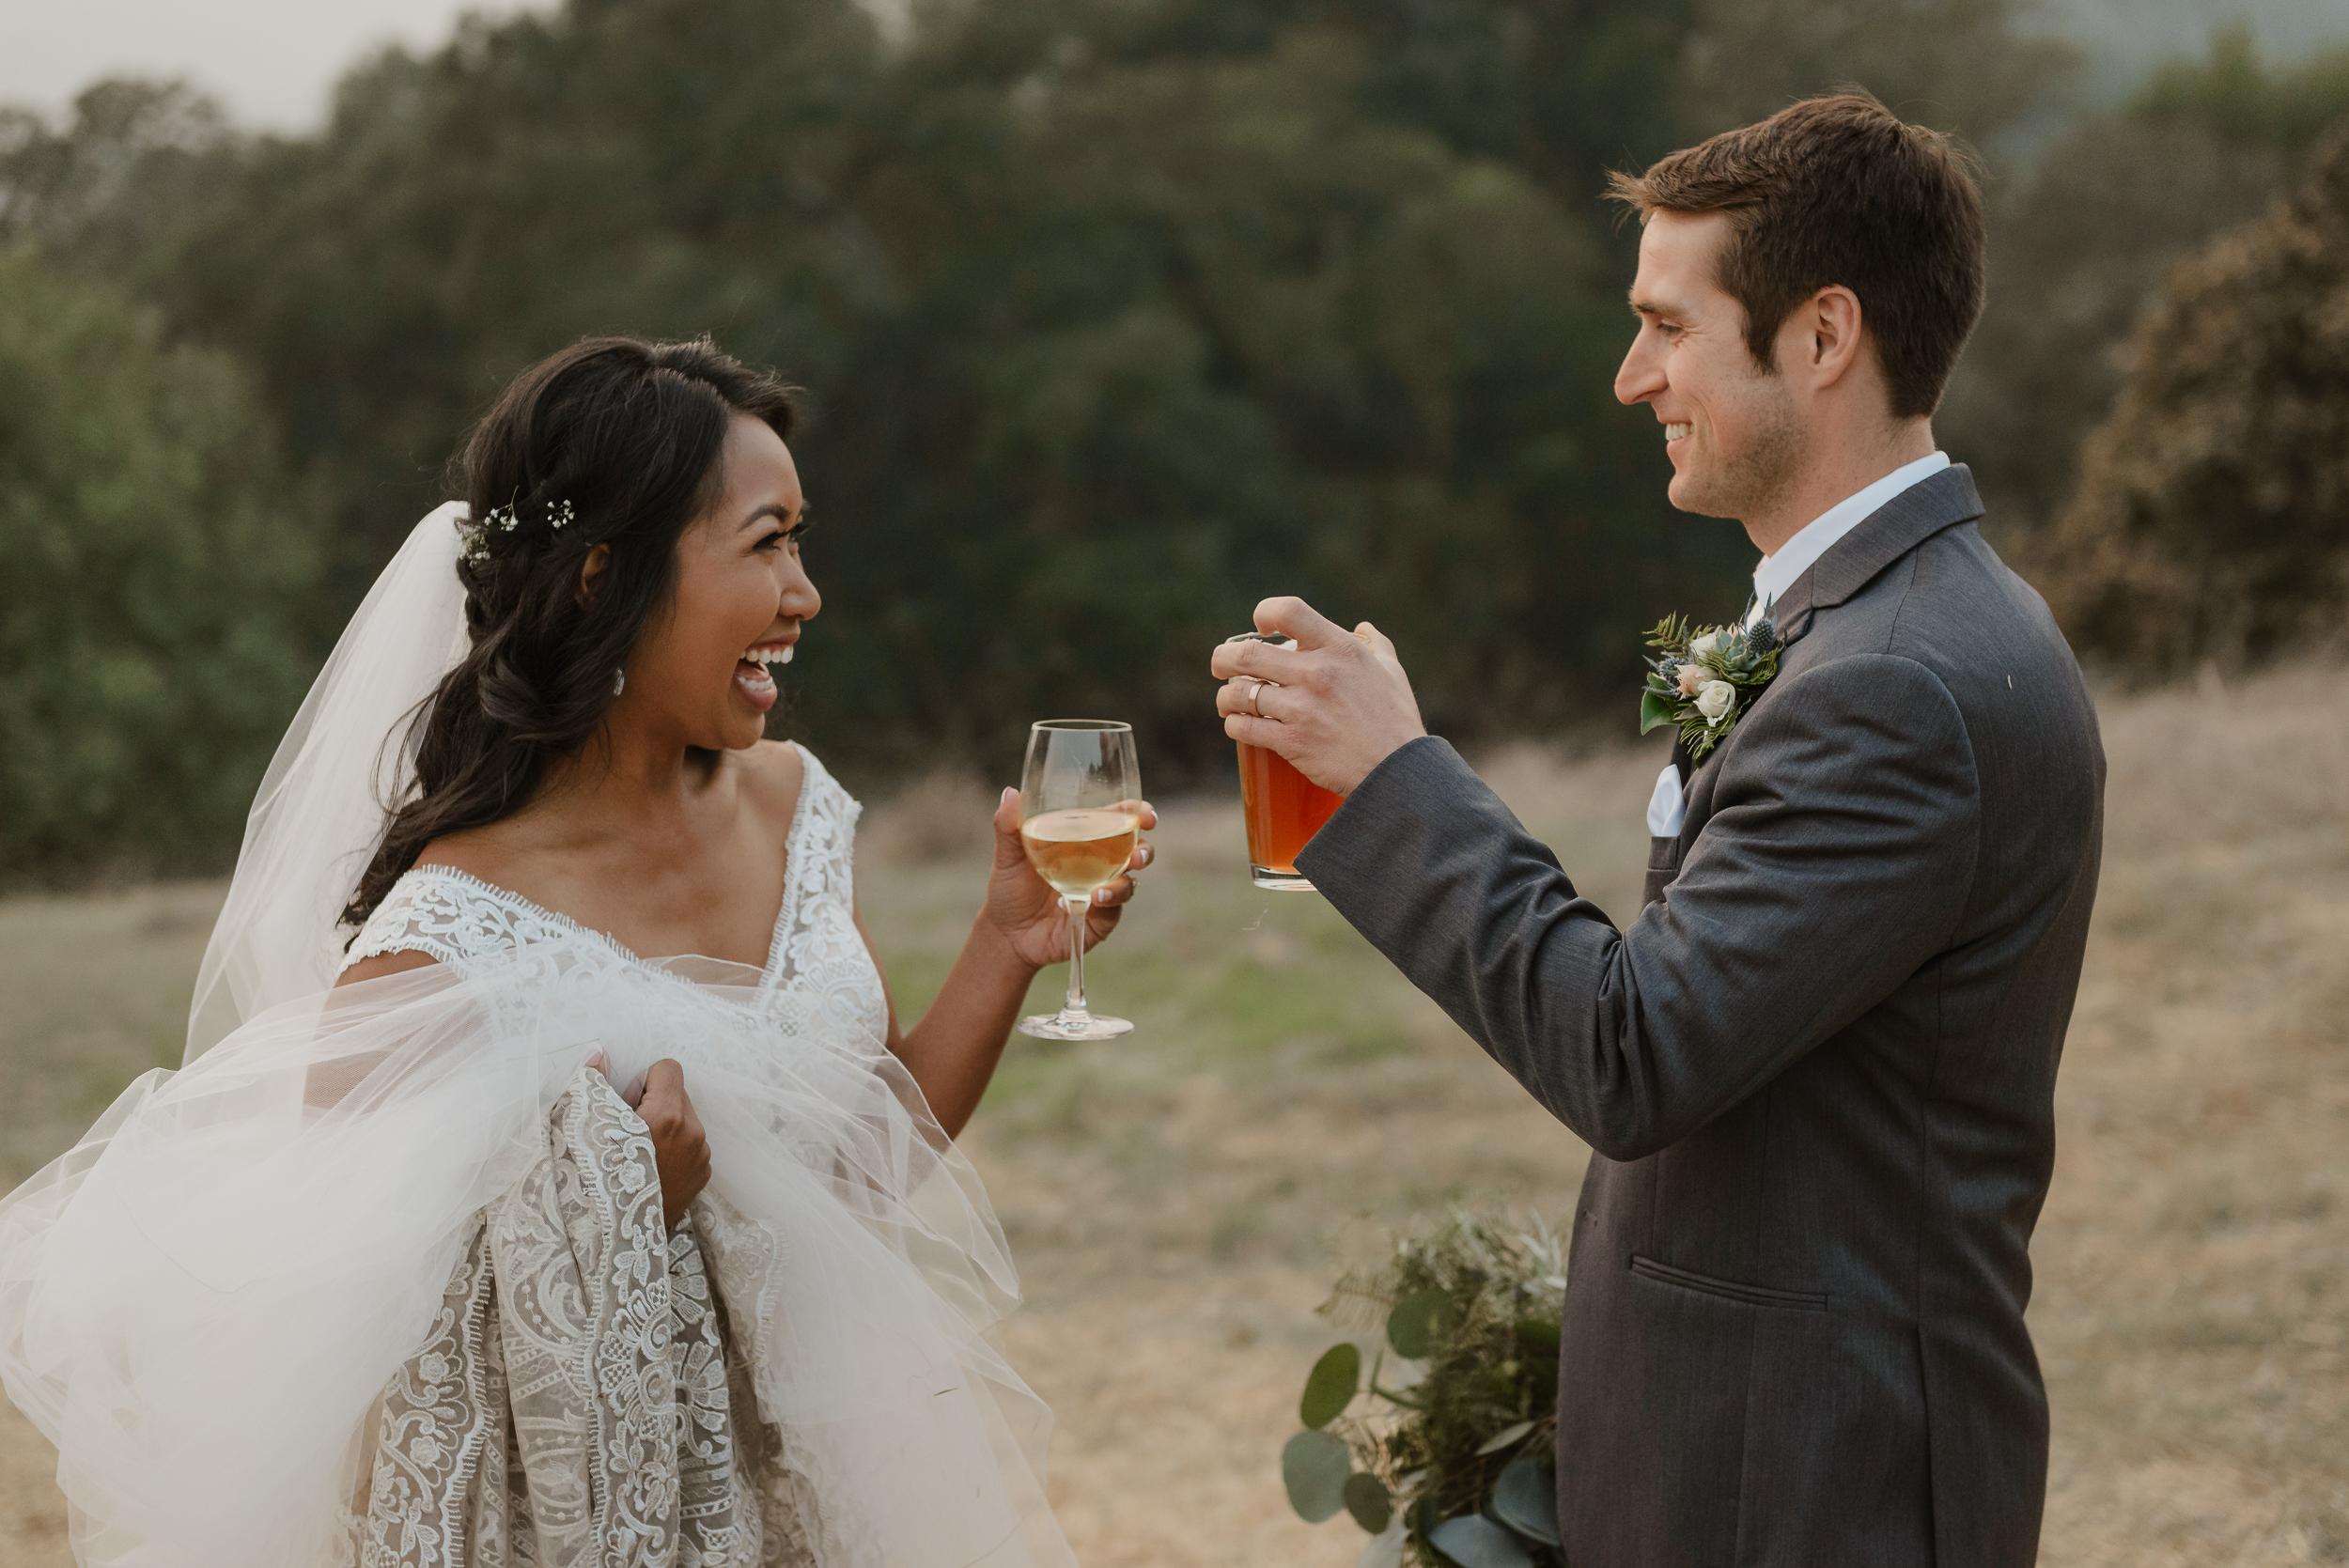 076marin-petaluma-backyard-wedding-vivianchen-529.jpg